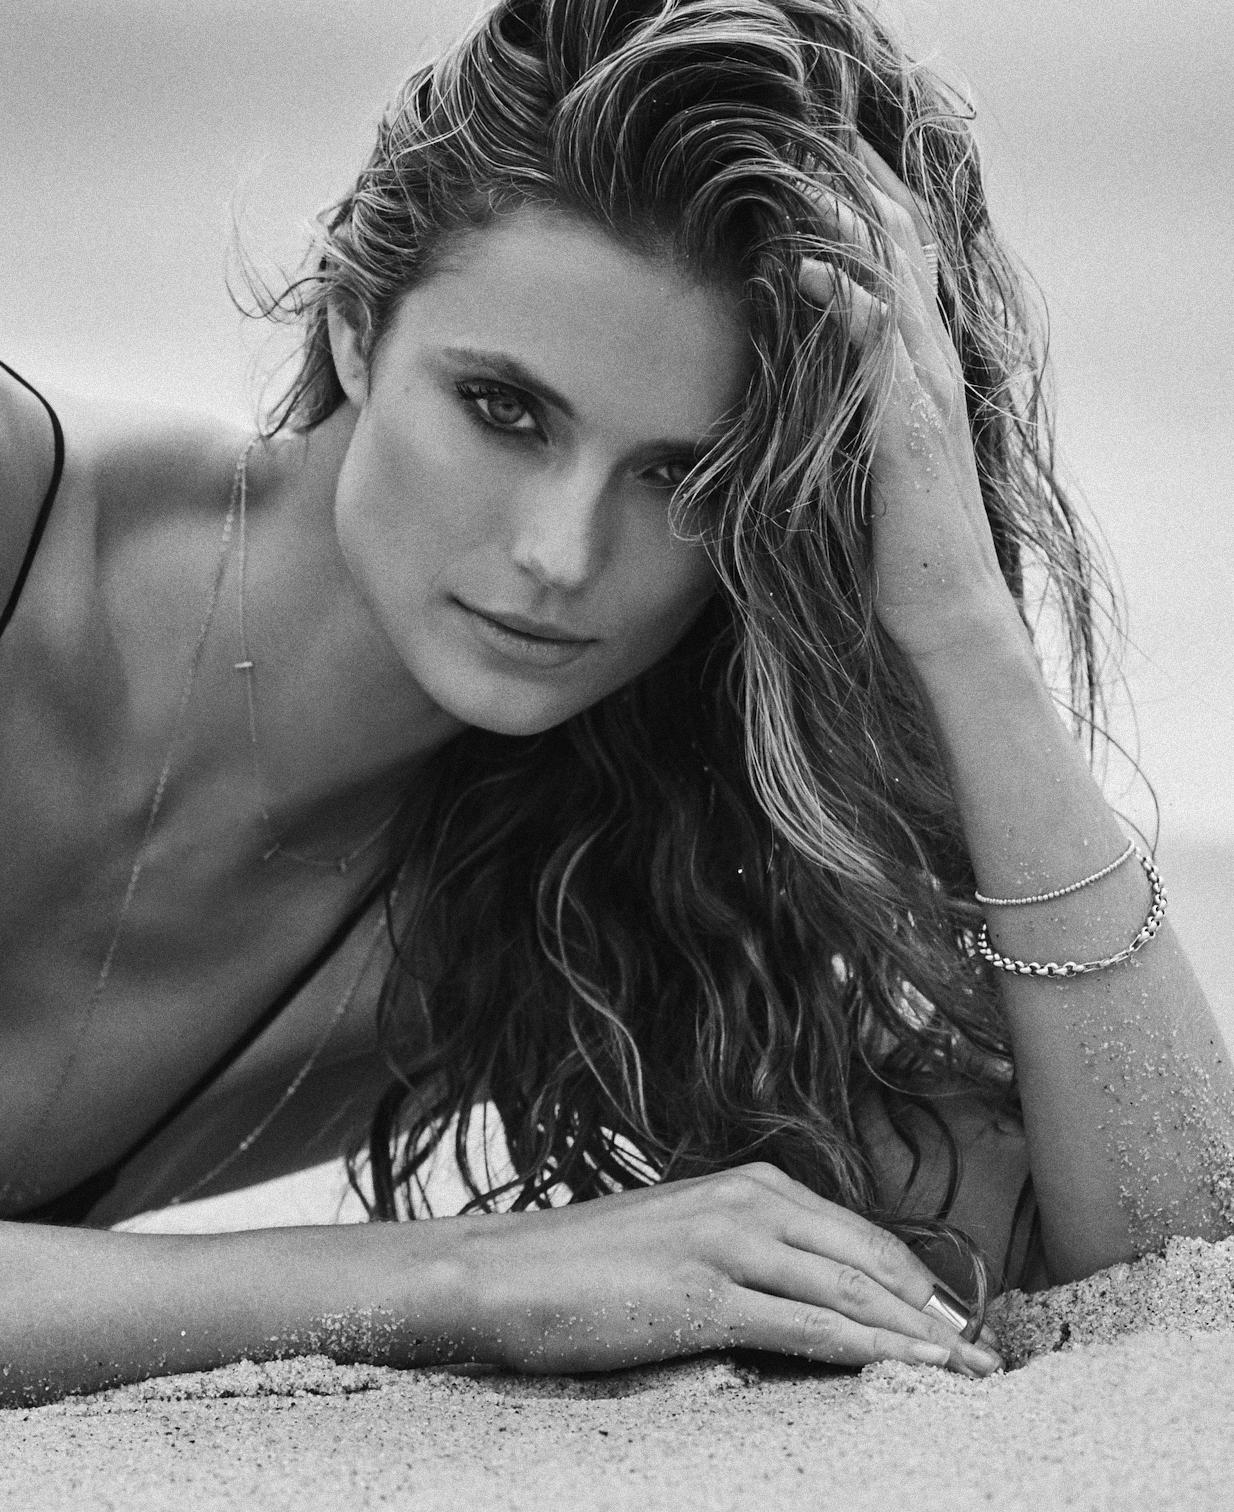 Kate Bock Beauty 1 BW.jpg